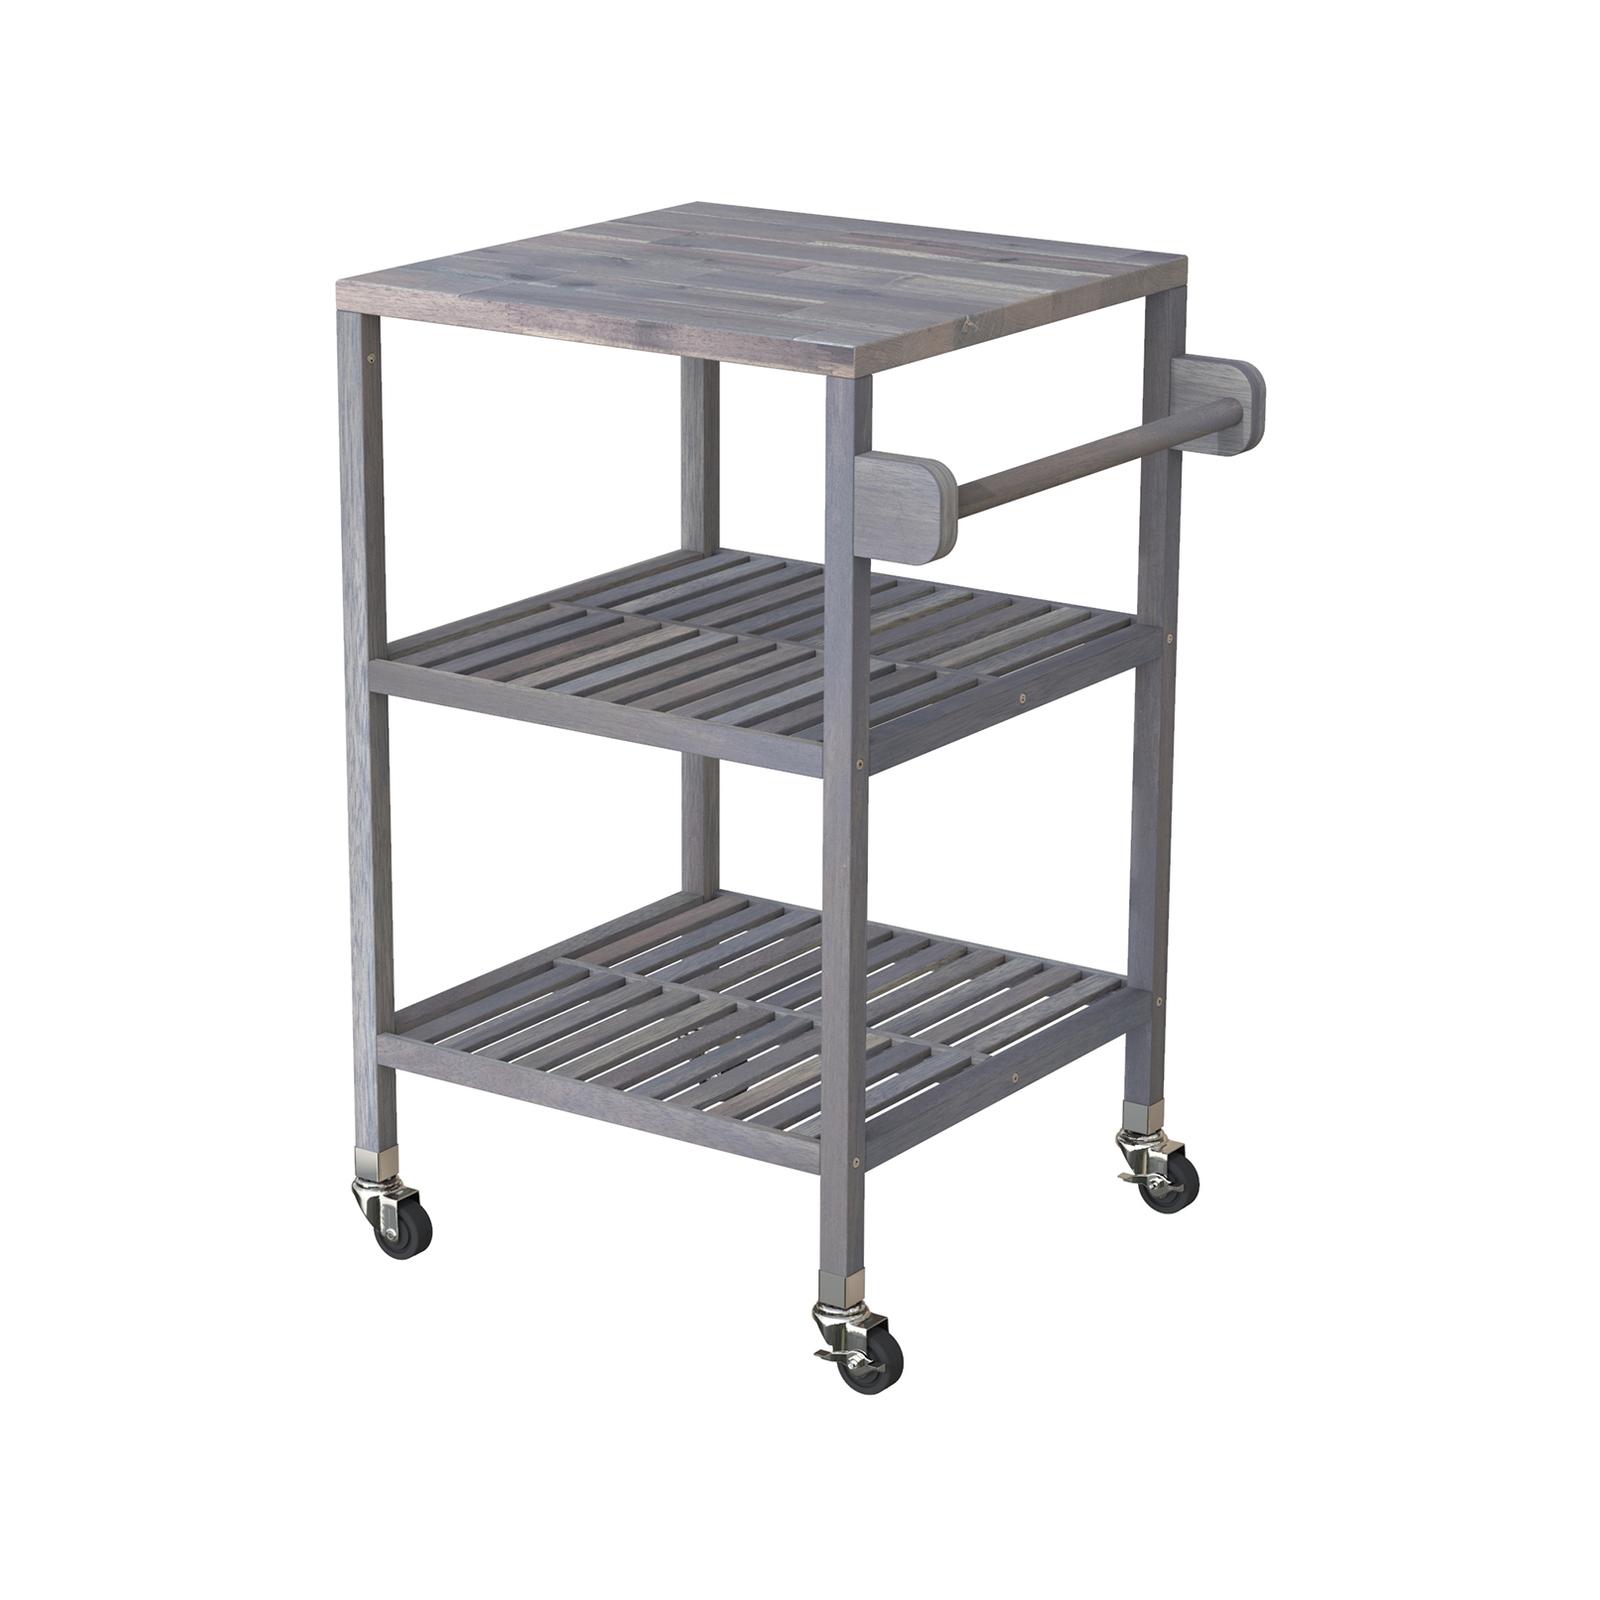 Interbuild 52 x 52 x 85cm Dusk Grey Holger Quattro Kitchen Cart